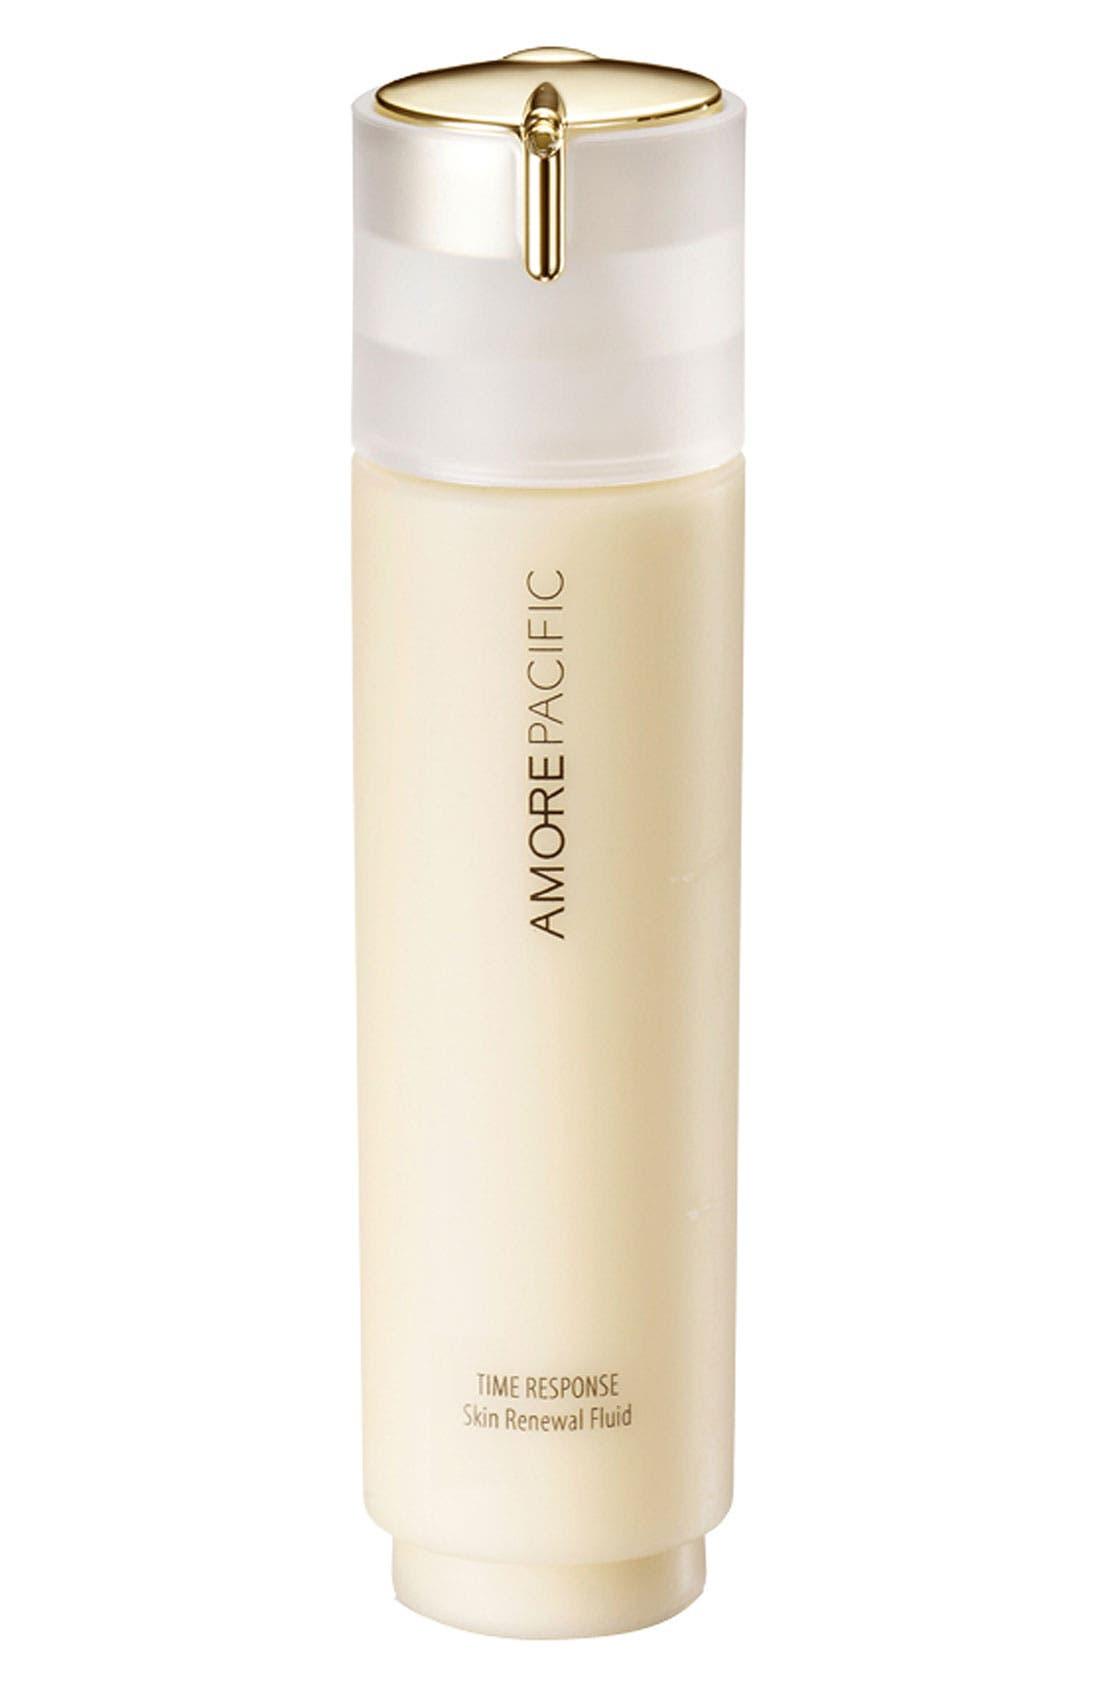 AMOREPACIFIC Time Response Skin Renewal Fluid